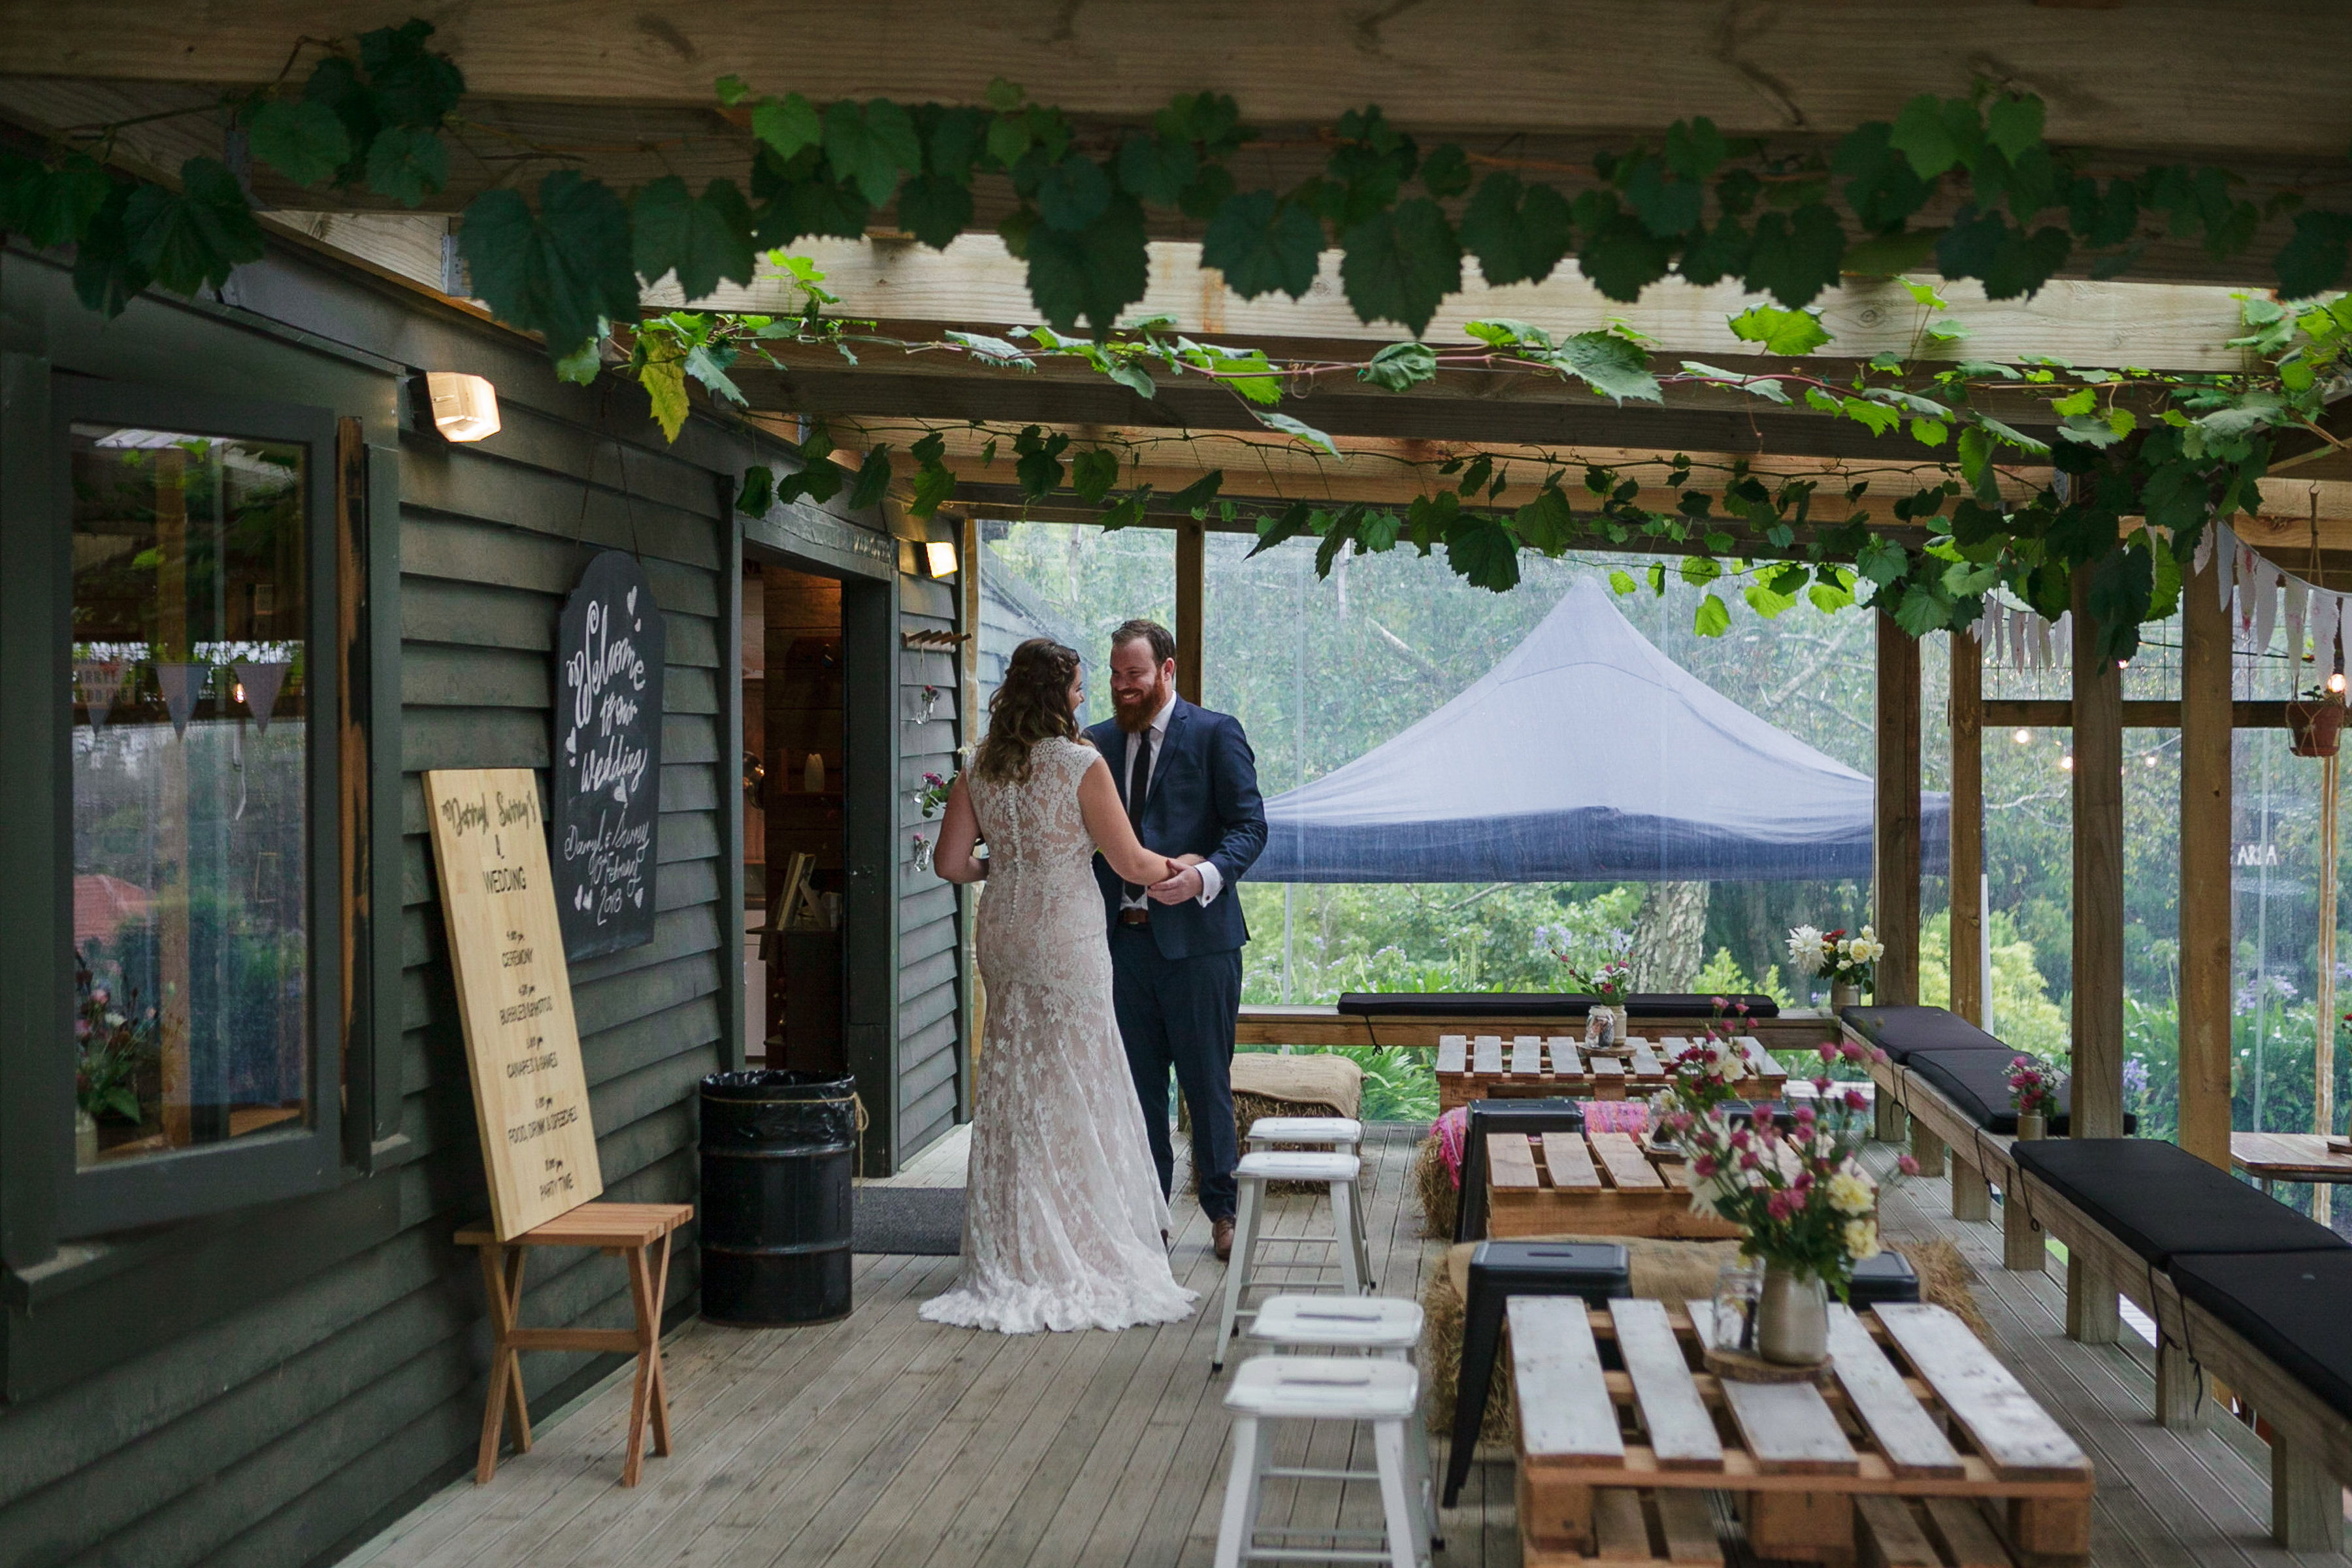 Surrey Darryl Our Wedding-HighlightsReel-0049